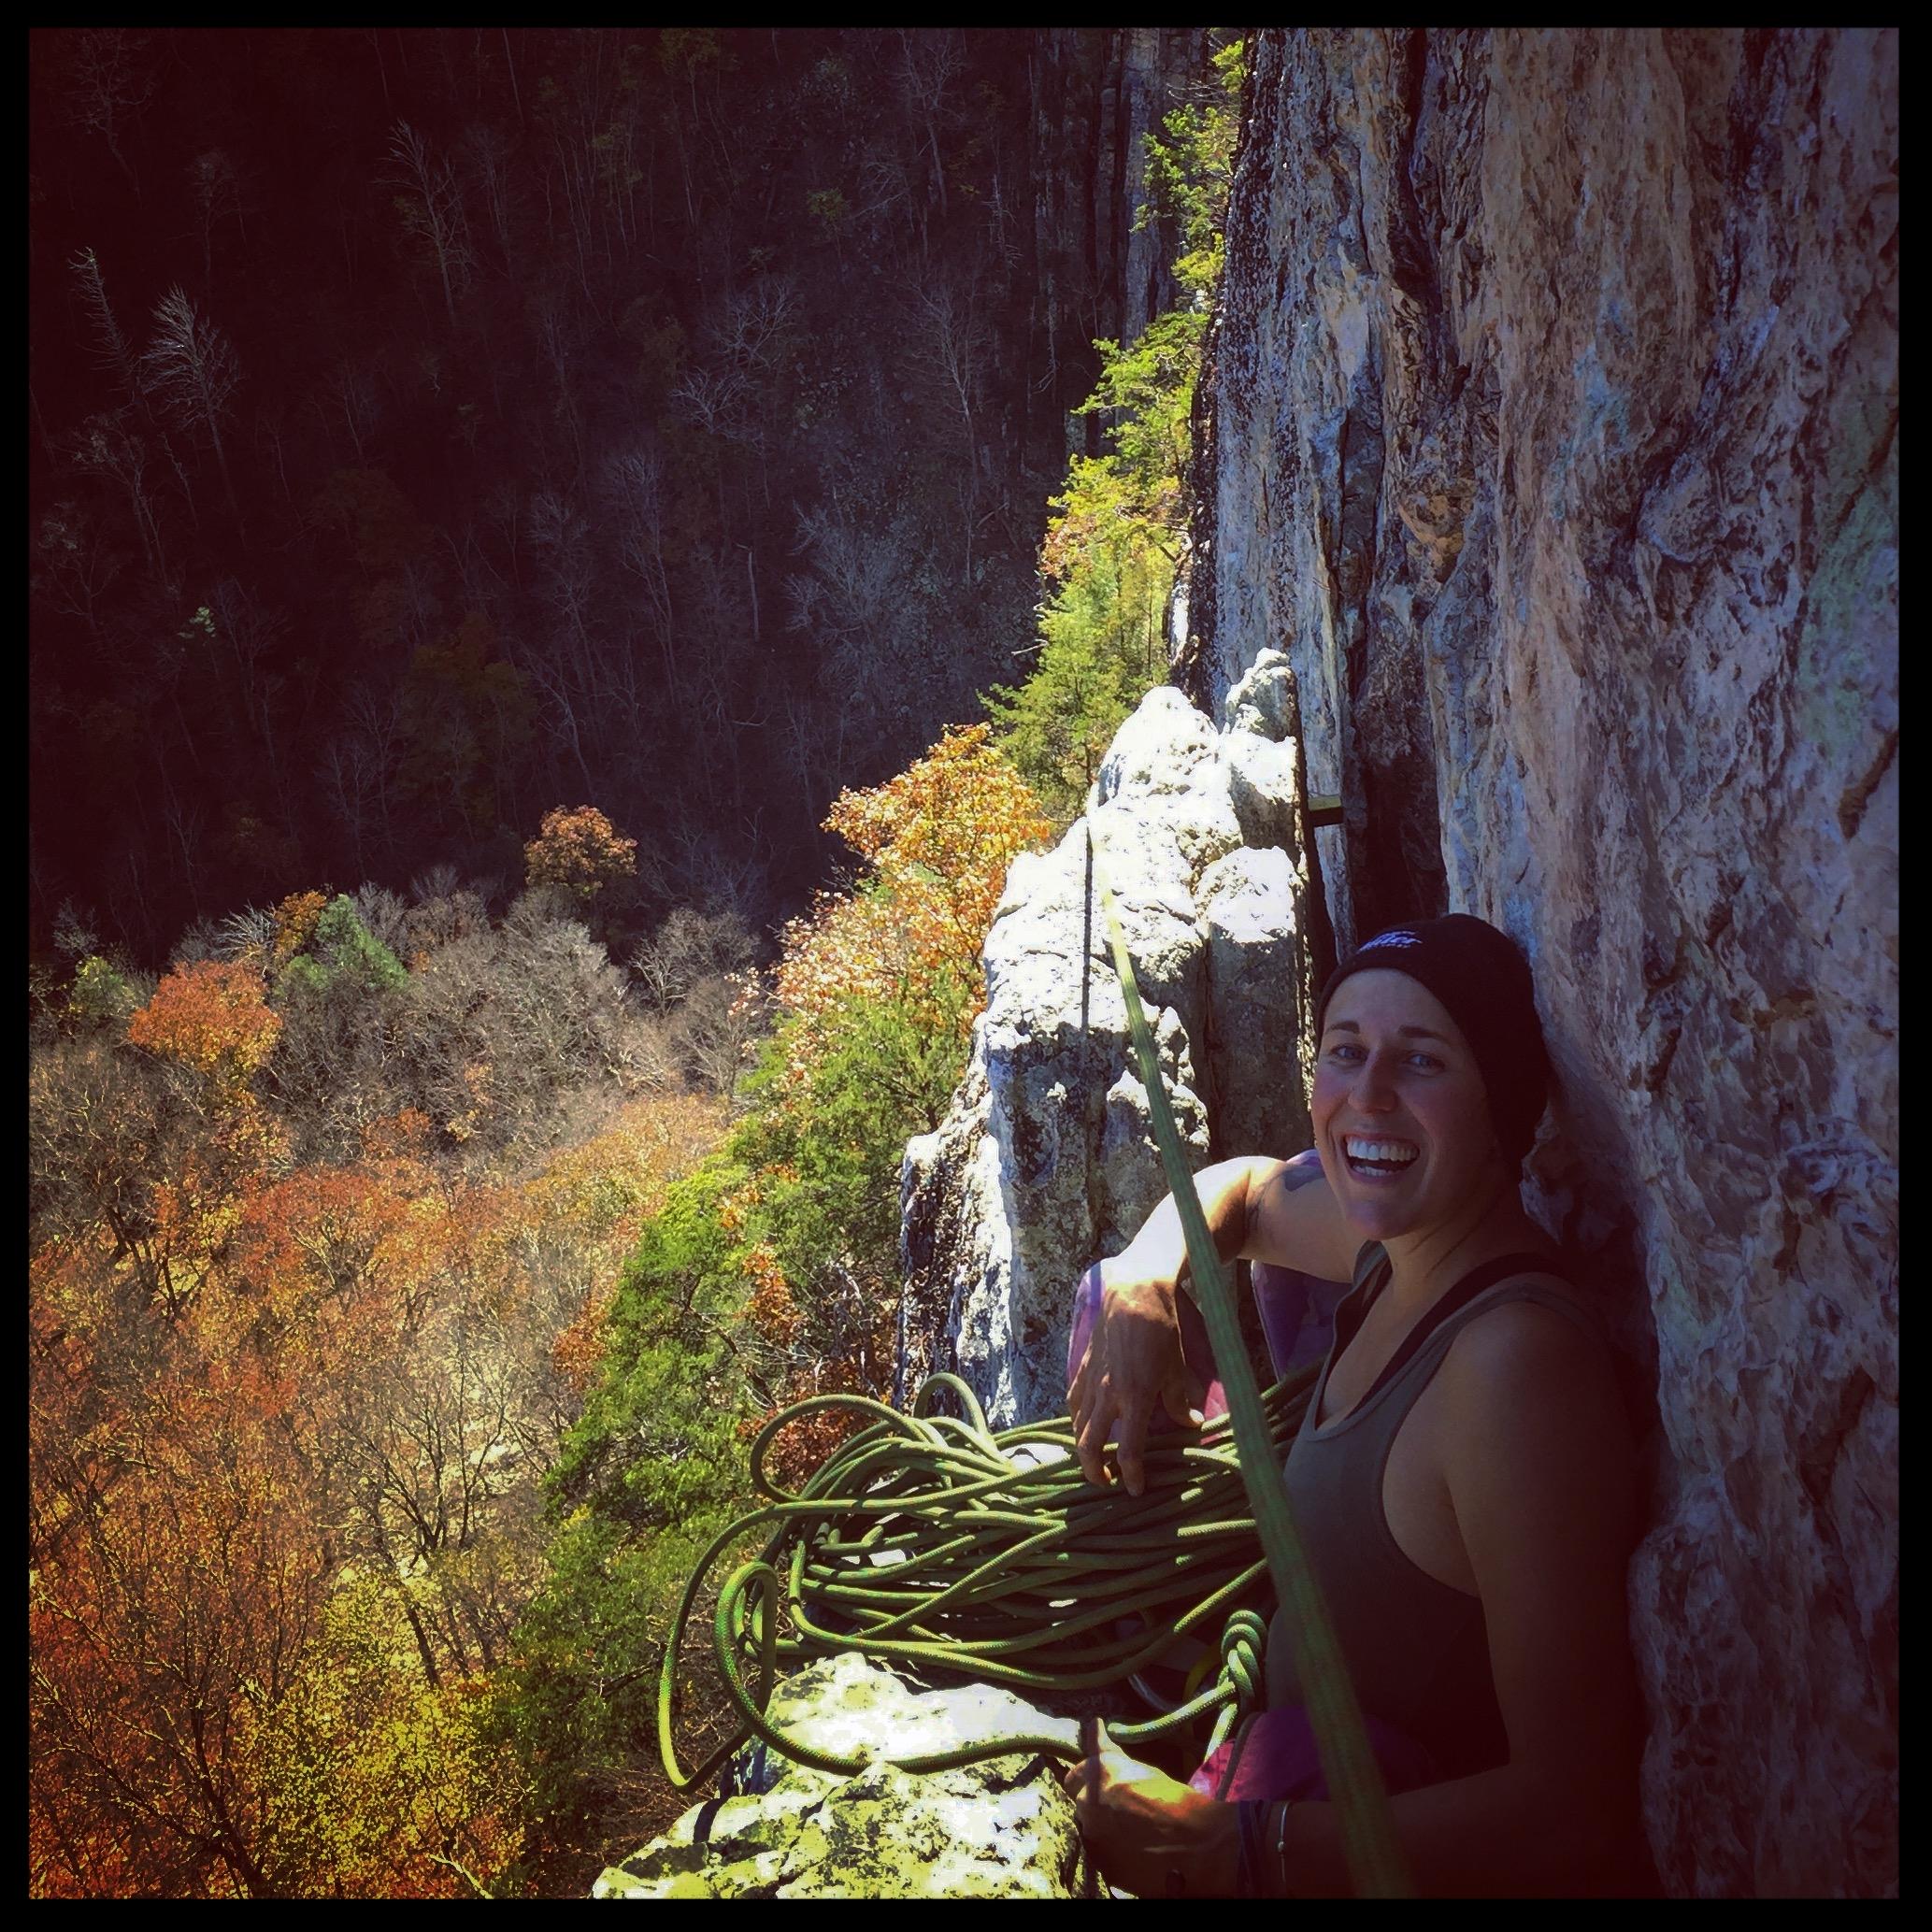 Seneca Rocks, West Virginia, Fall 2016. When I'm not foraging, I'm climbing, running, hiking, camping, or cooking.